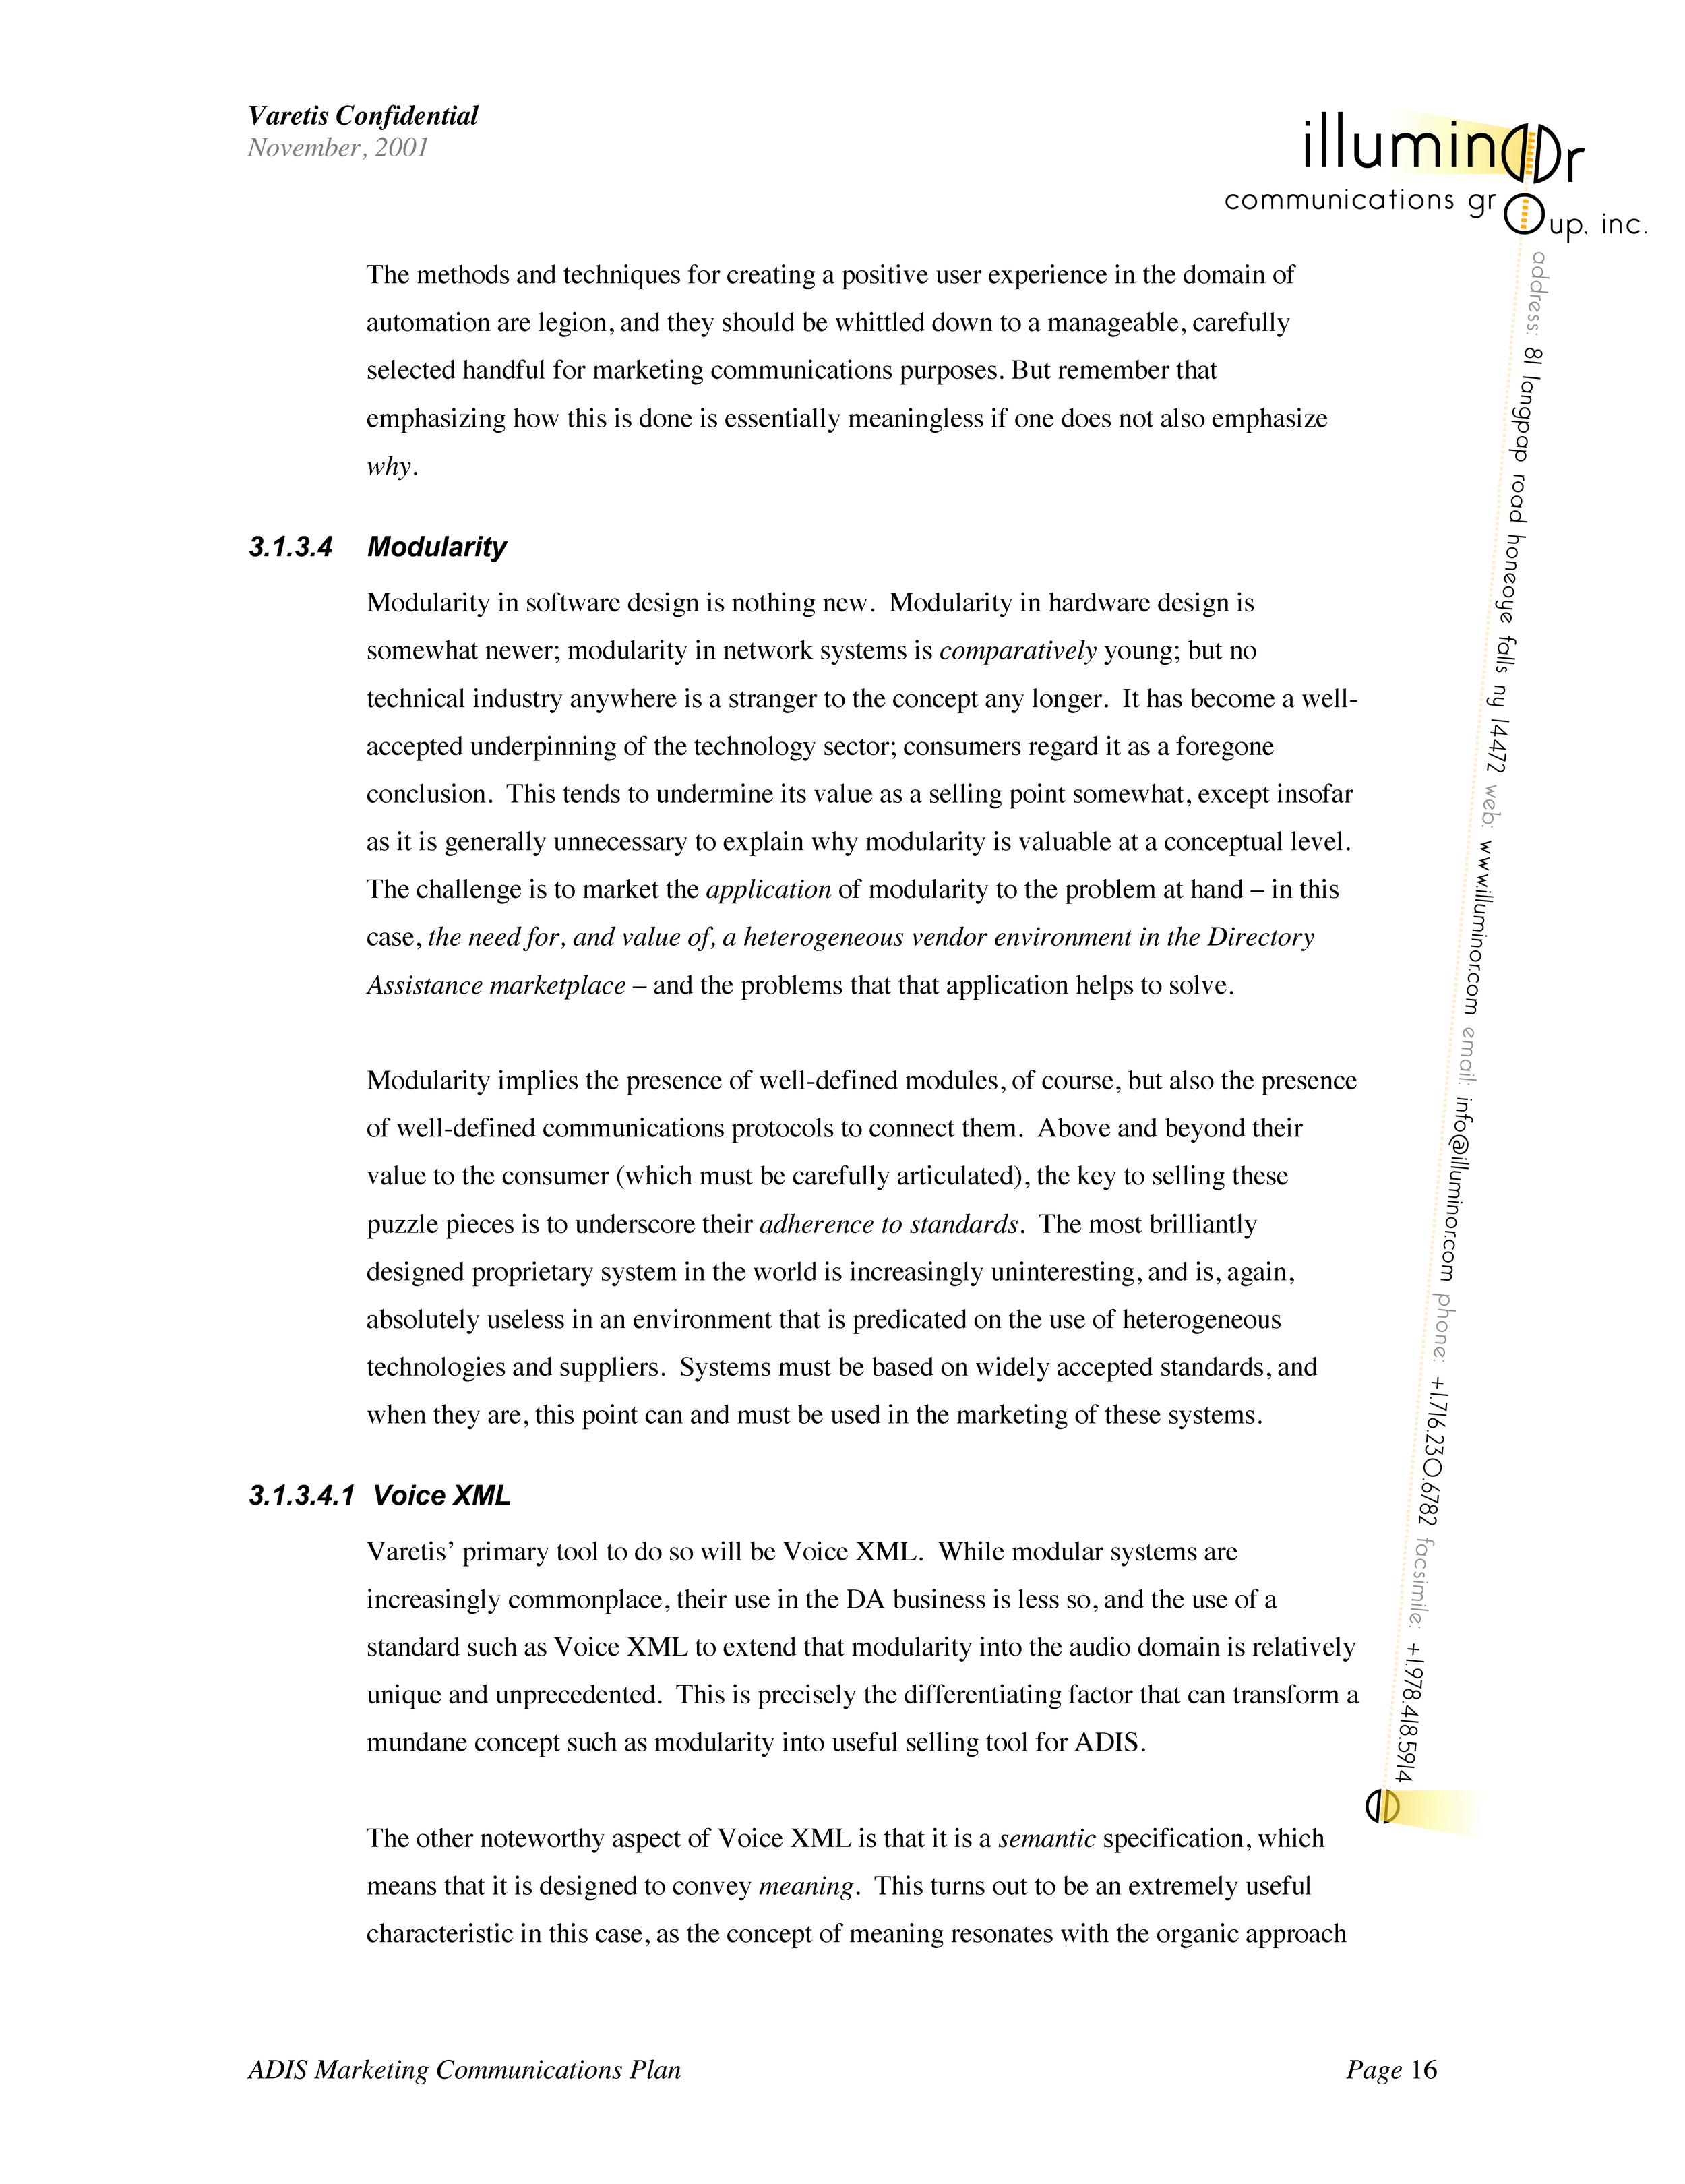 ADIS Marcomm Plan_Page_16.png